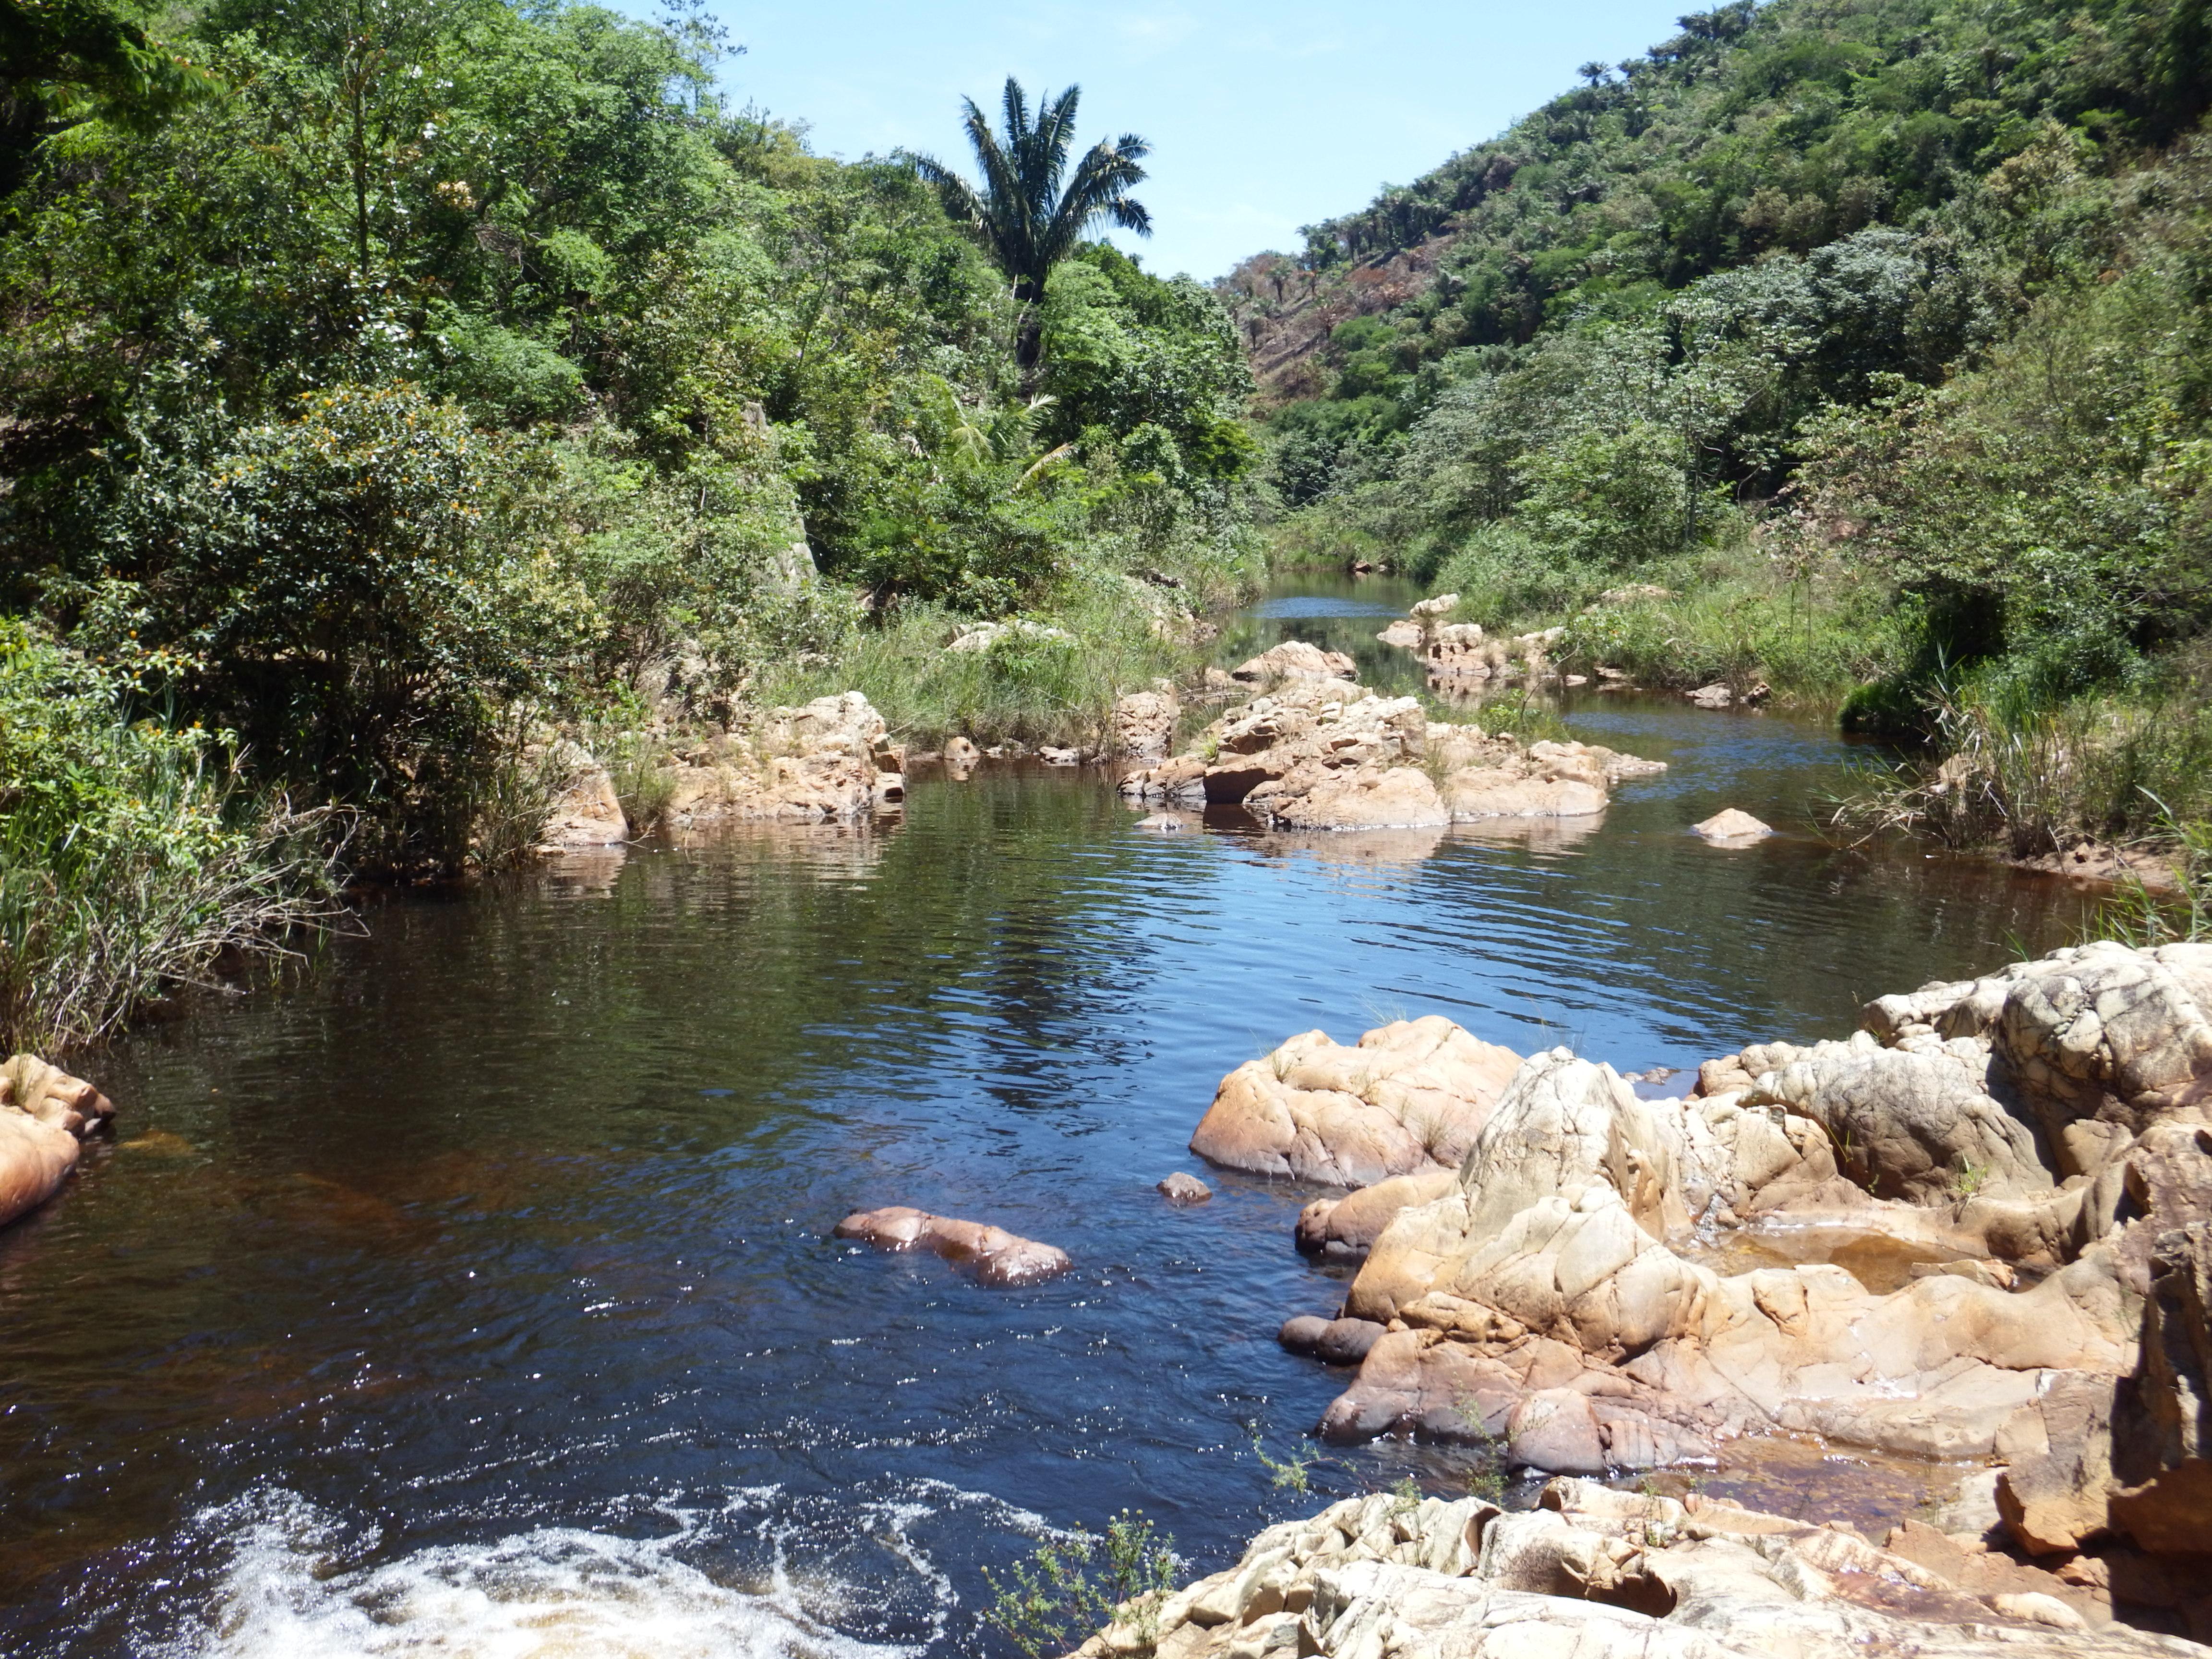 Mirangaba Bahia fonte: upload.wikimedia.org